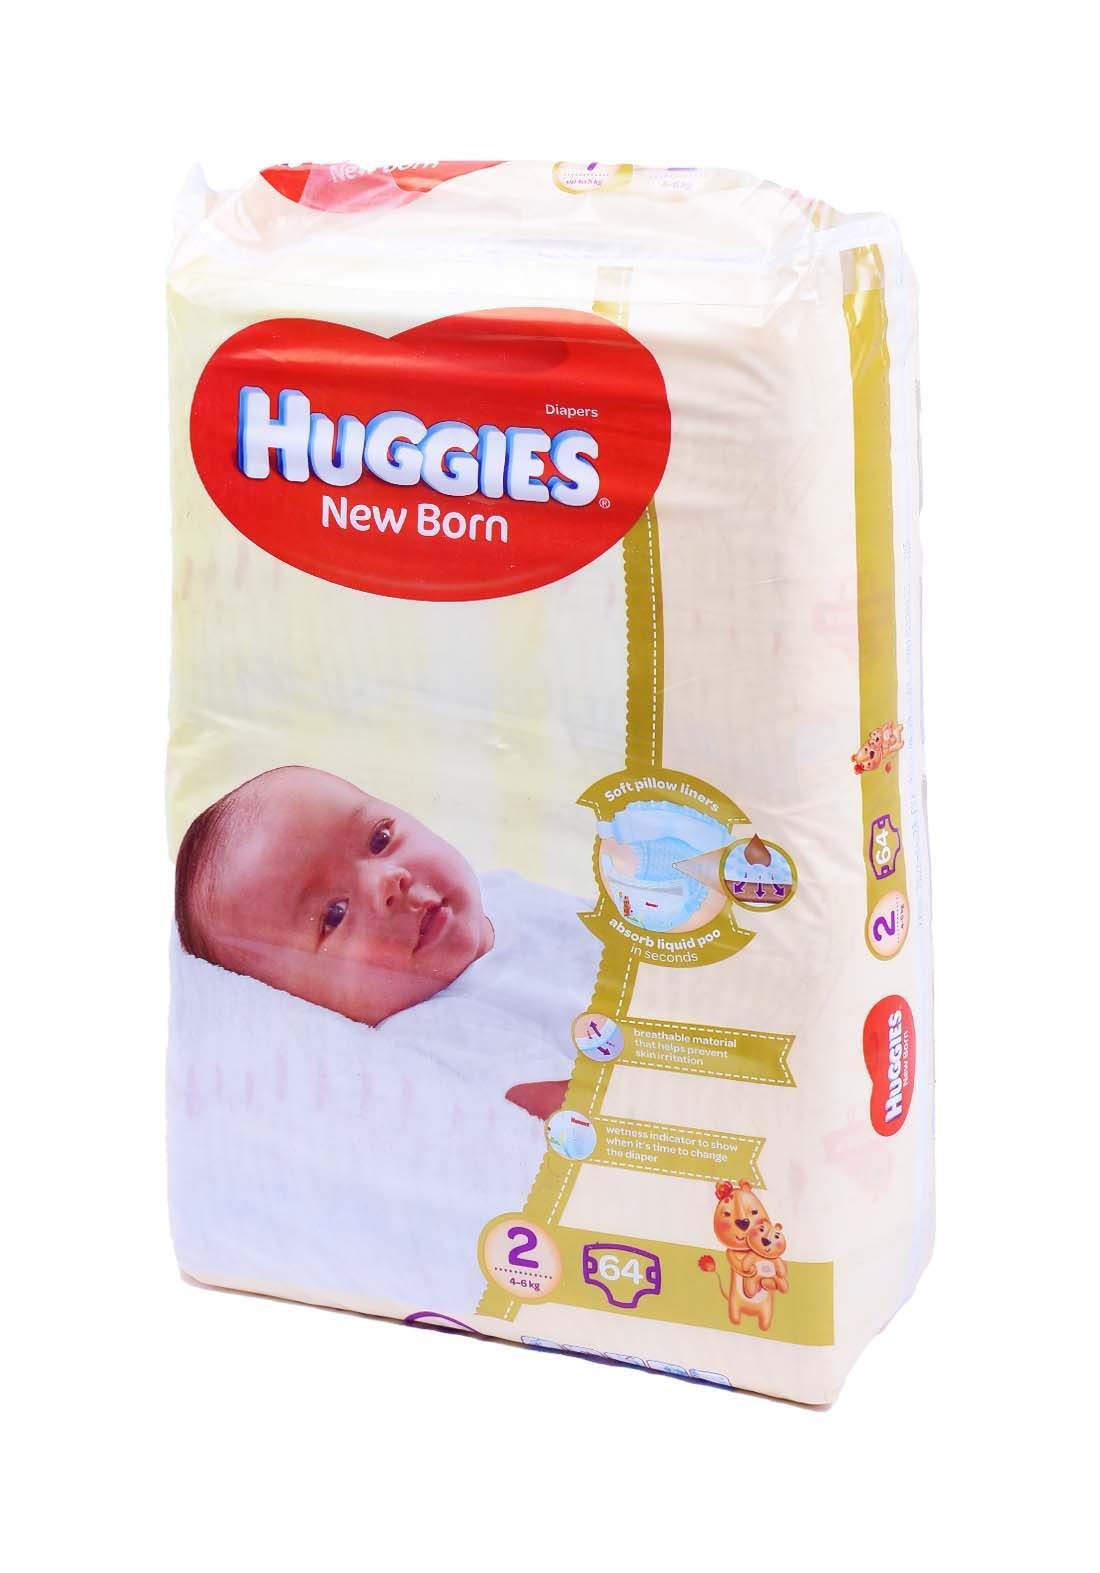 Huggies 2-6 Kg 64 Pcs حفاضات هجيز للاطفال حديثي الولادة عادي رقم 2